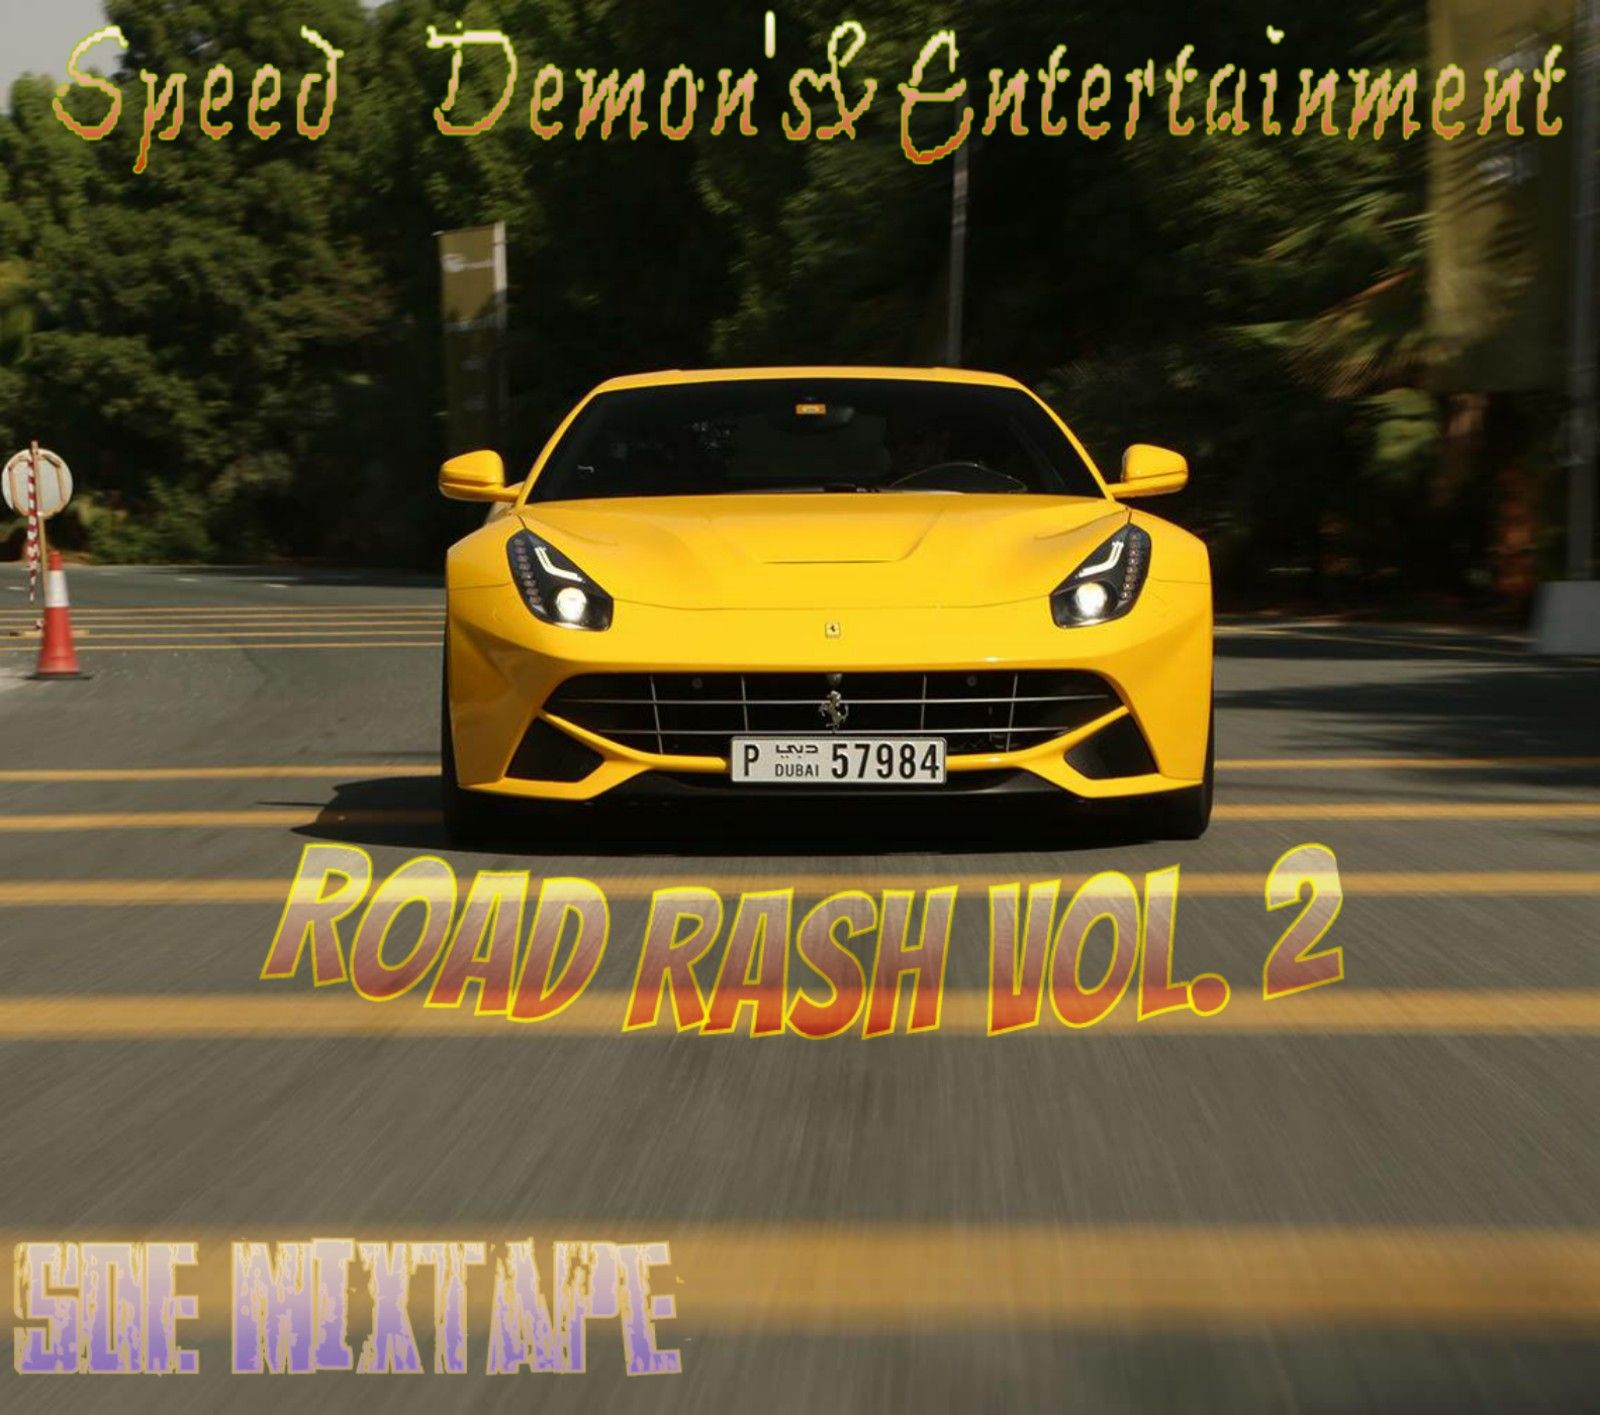 Road Rash Volume 2 by Speed Demon's Entertainment, from Da B.B.C Also Known As Bajan Braided ...